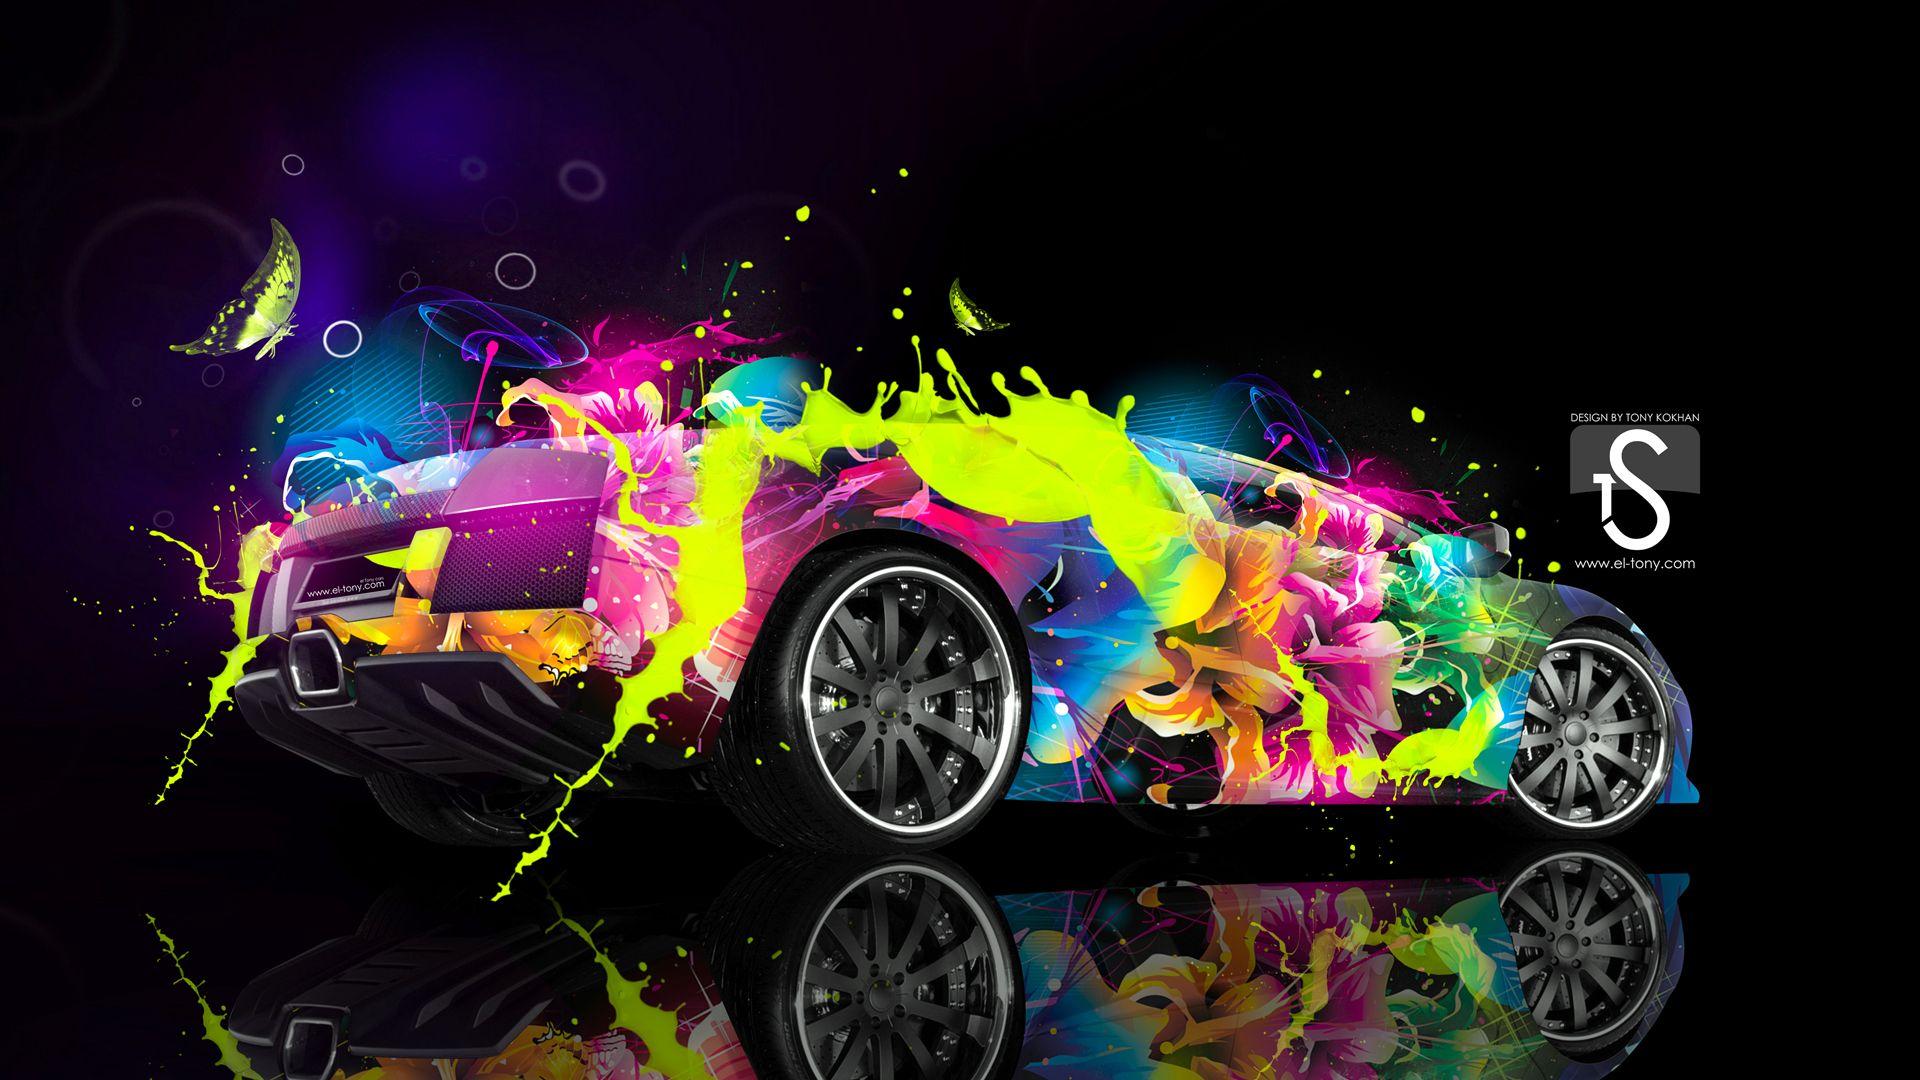 Colorful Cars Wallpaper Full Hd S2w1t5 1920x1080 Px 1 05